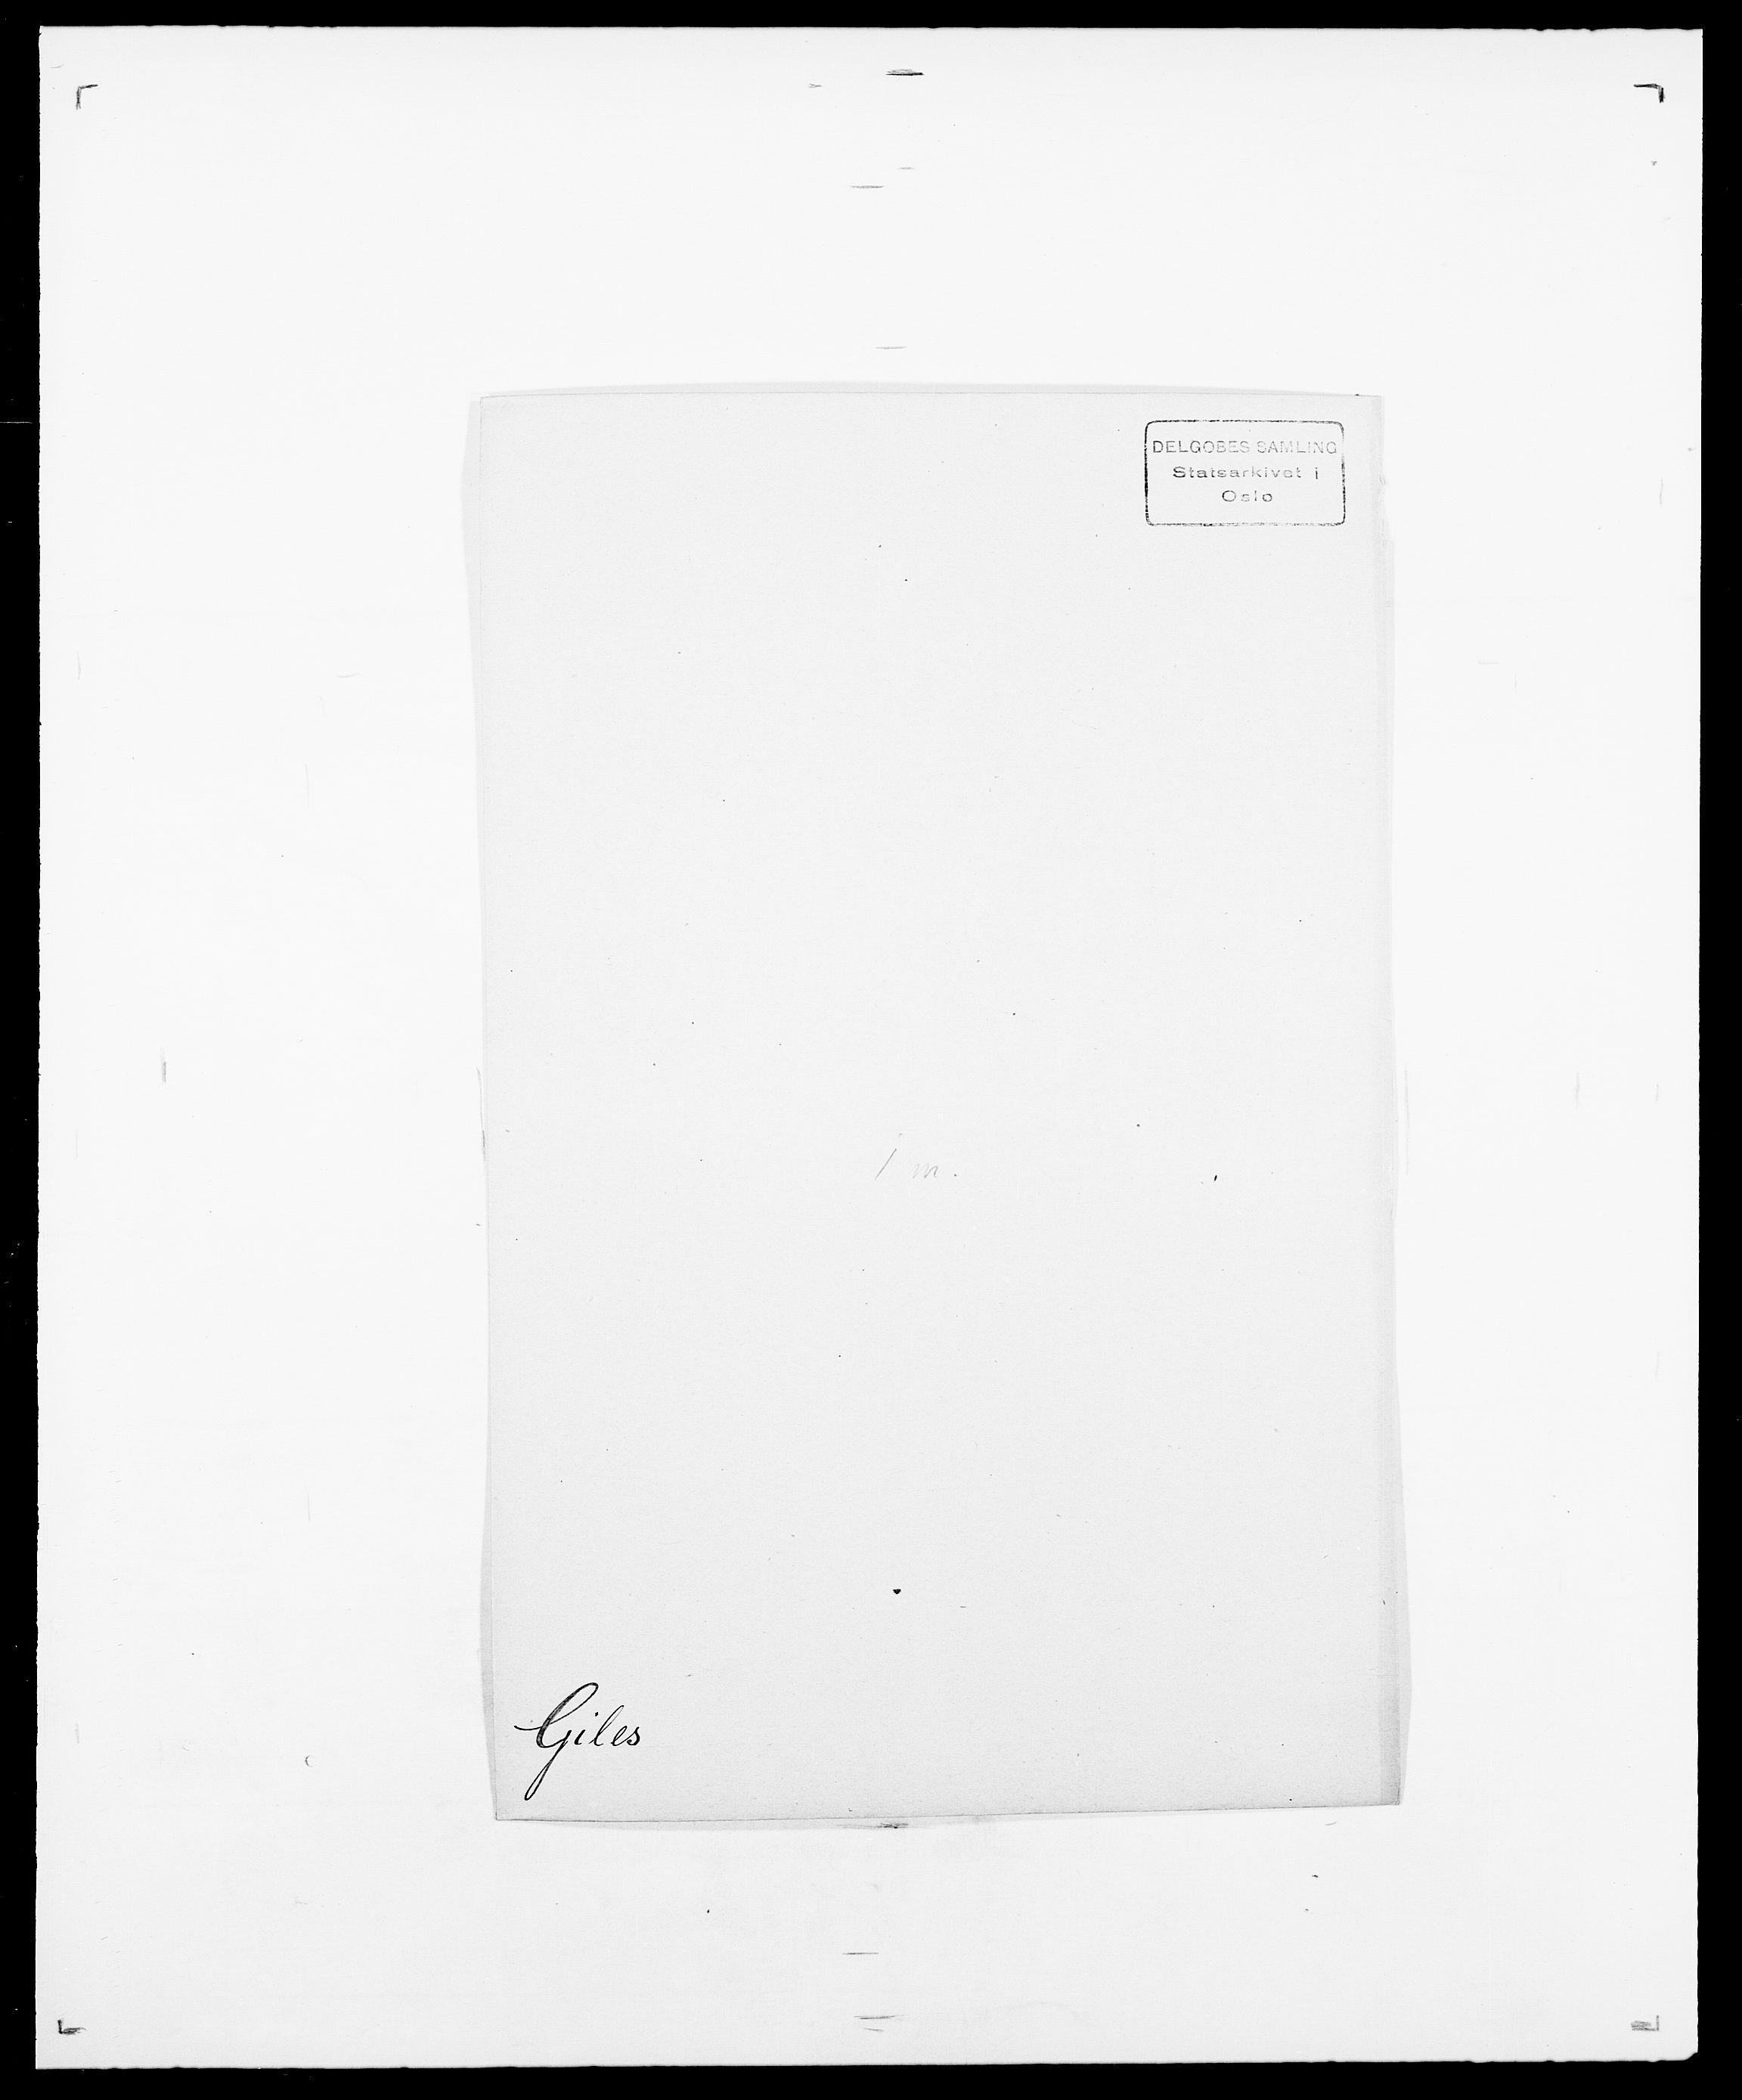 SAO, Delgobe, Charles Antoine - samling, D/Da/L0014: Giebdhausen - Grip, s. 26